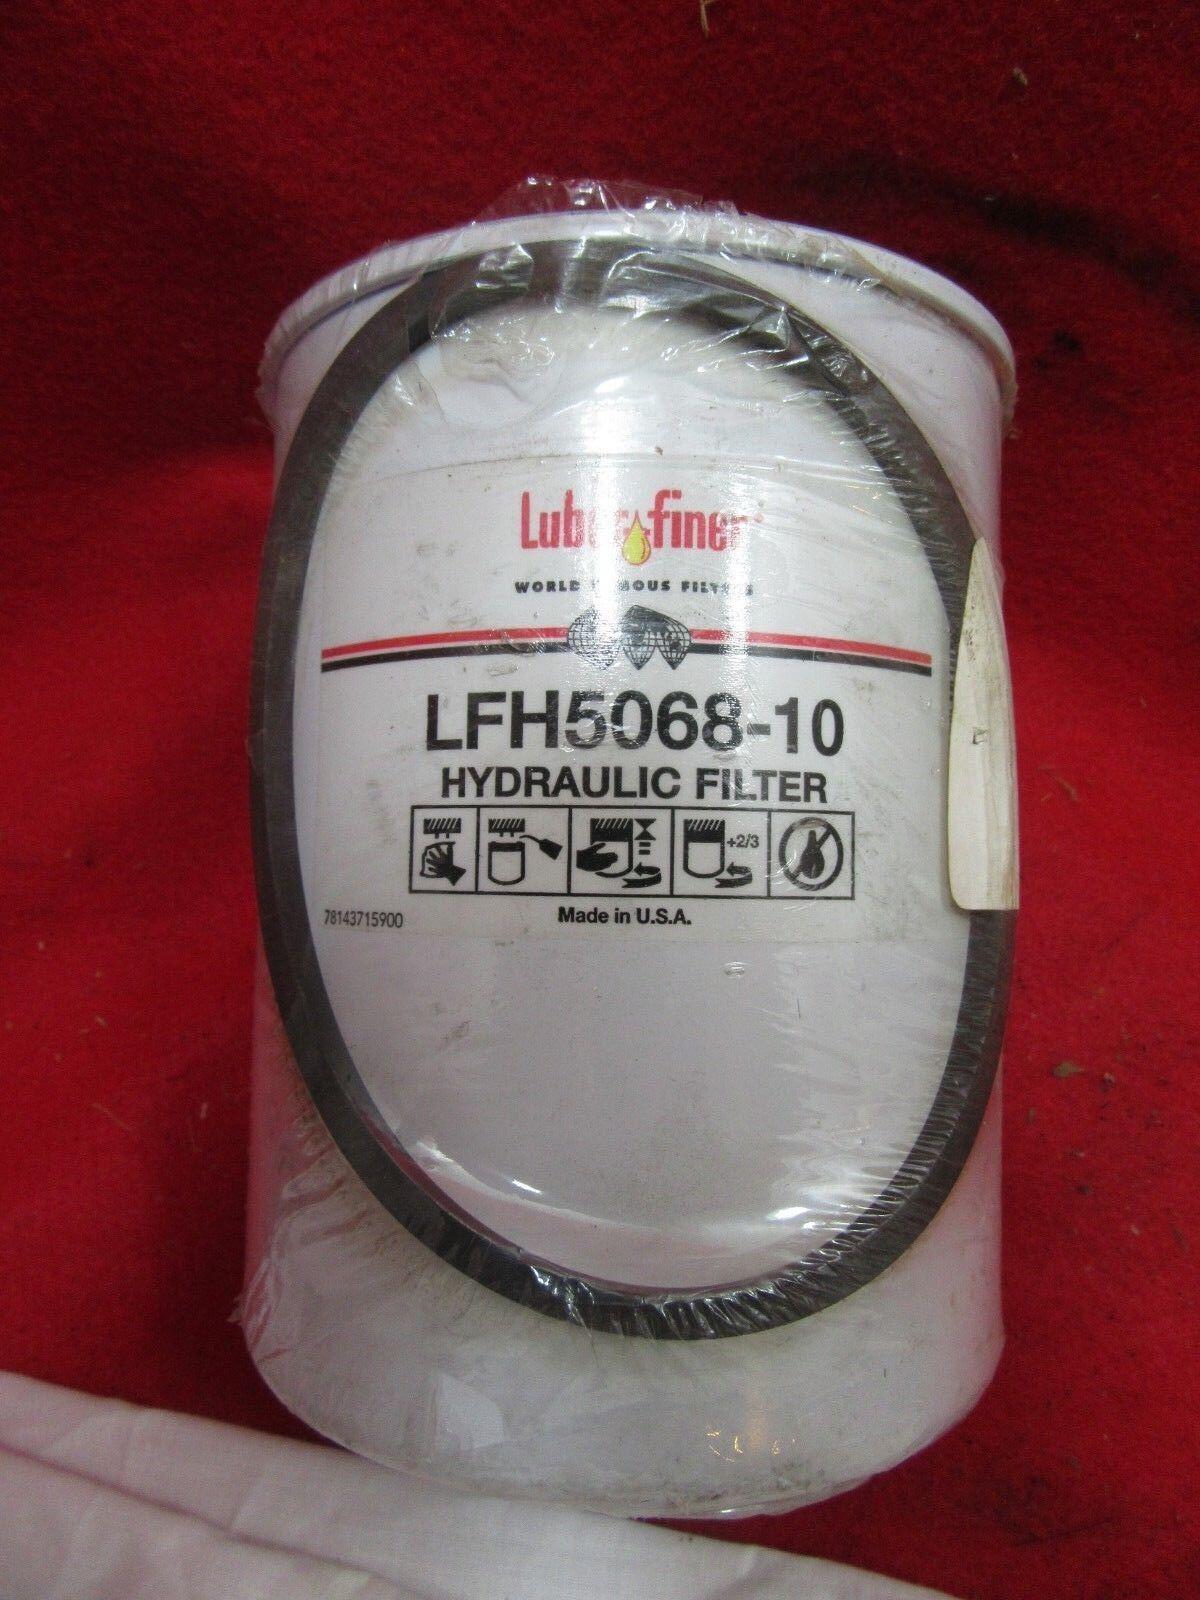 Part Number LFH5068-10